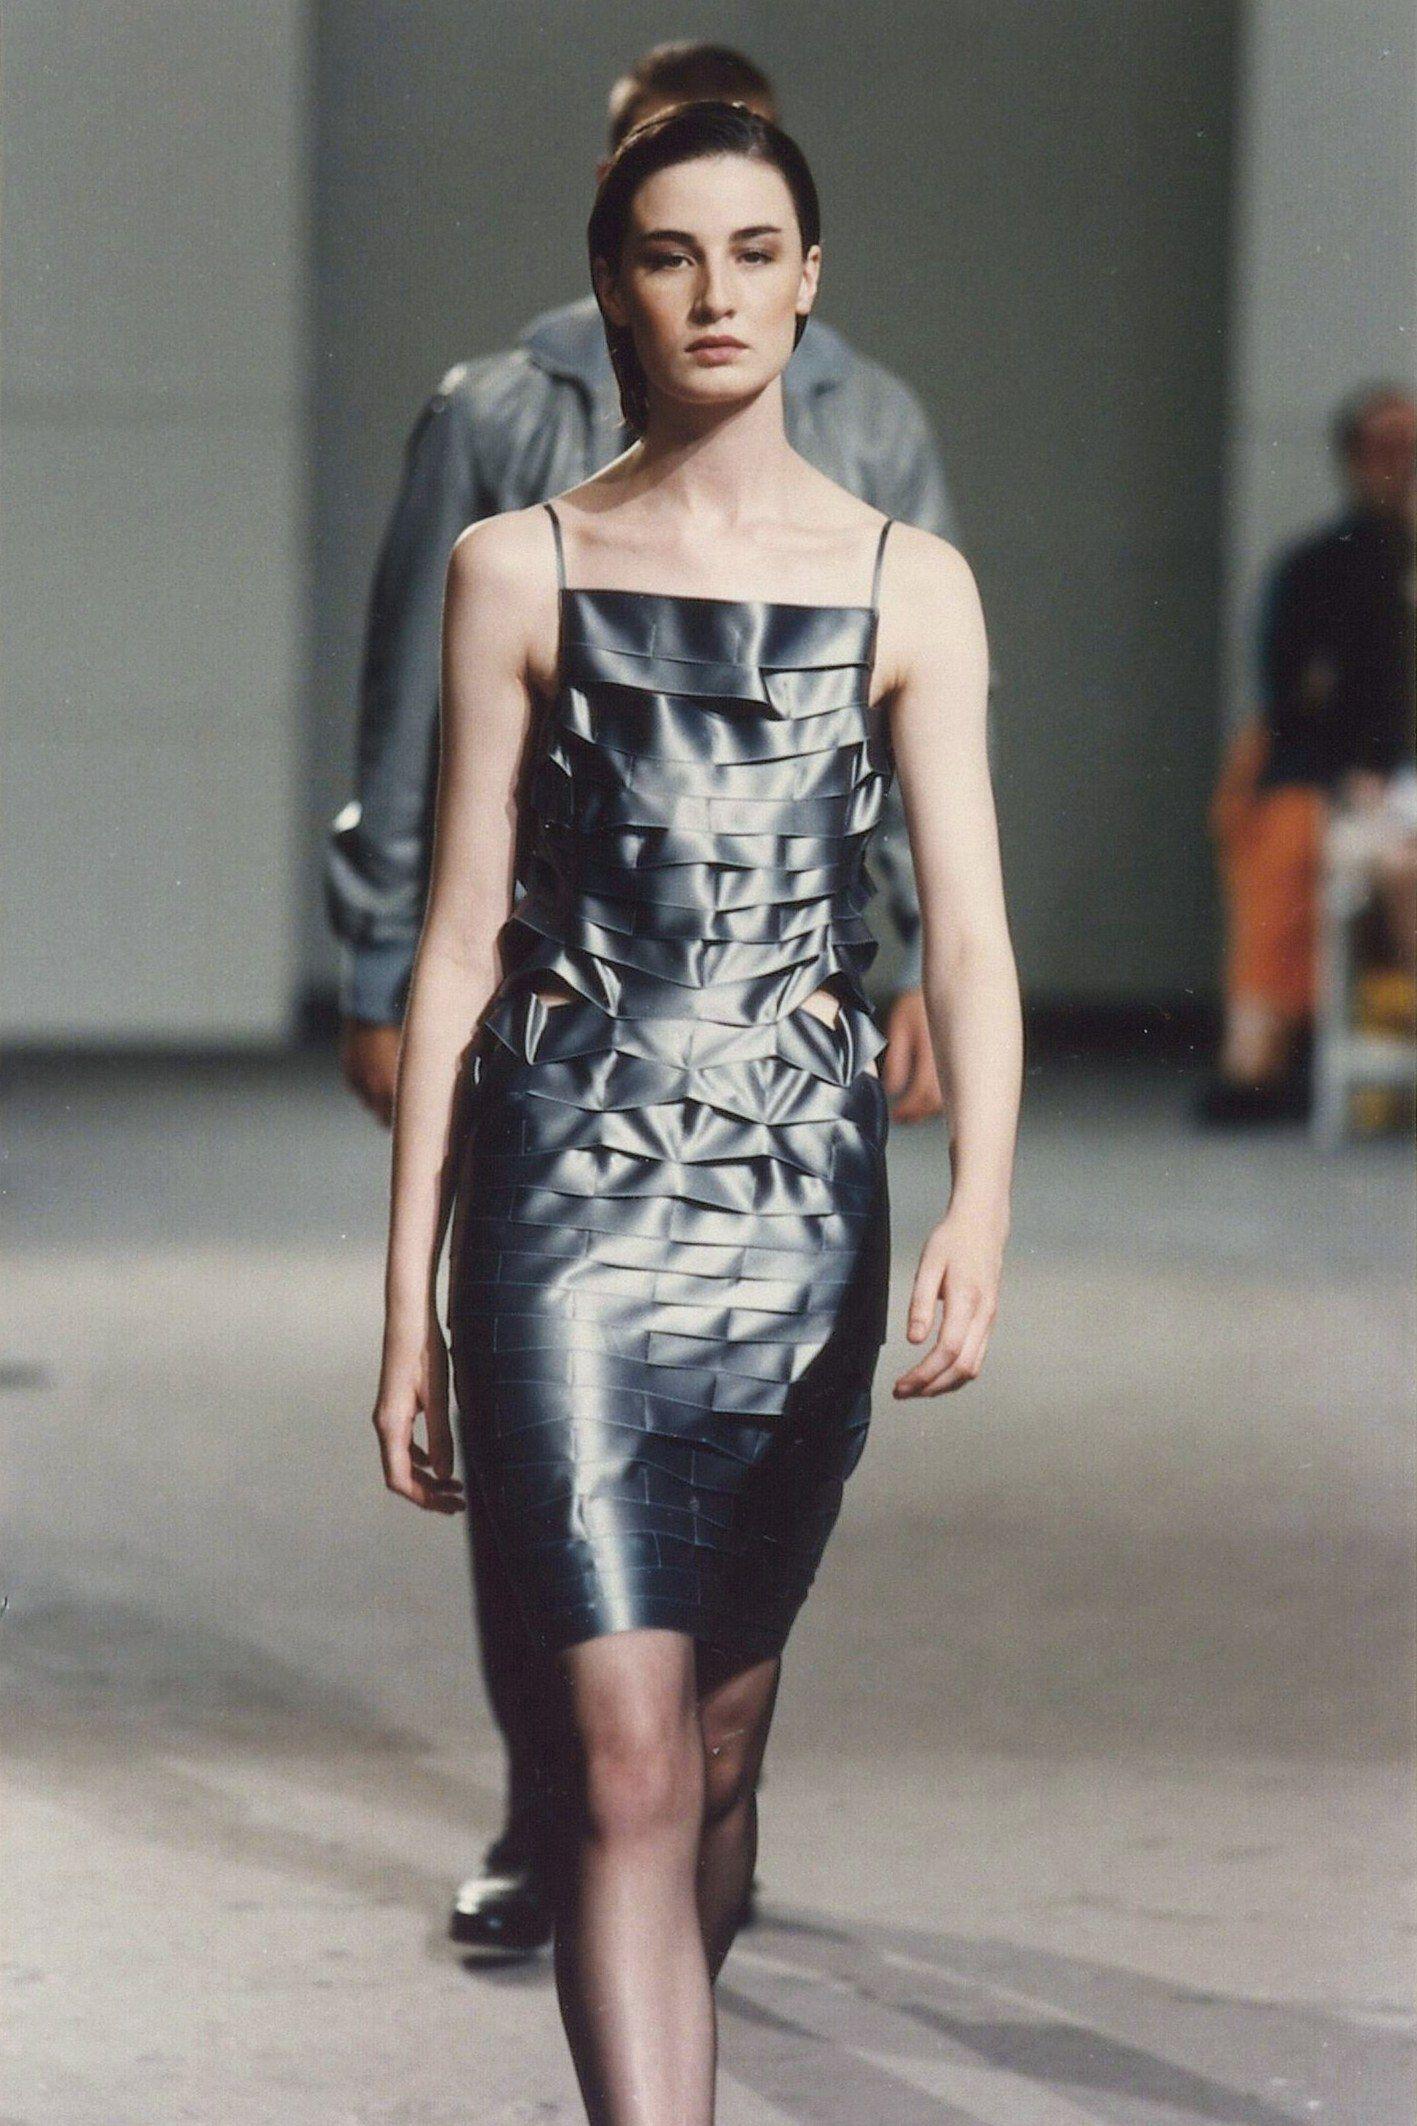 Helmut Lang / Spring/Summer 1998 / Satin segmented tube dress / SOLD